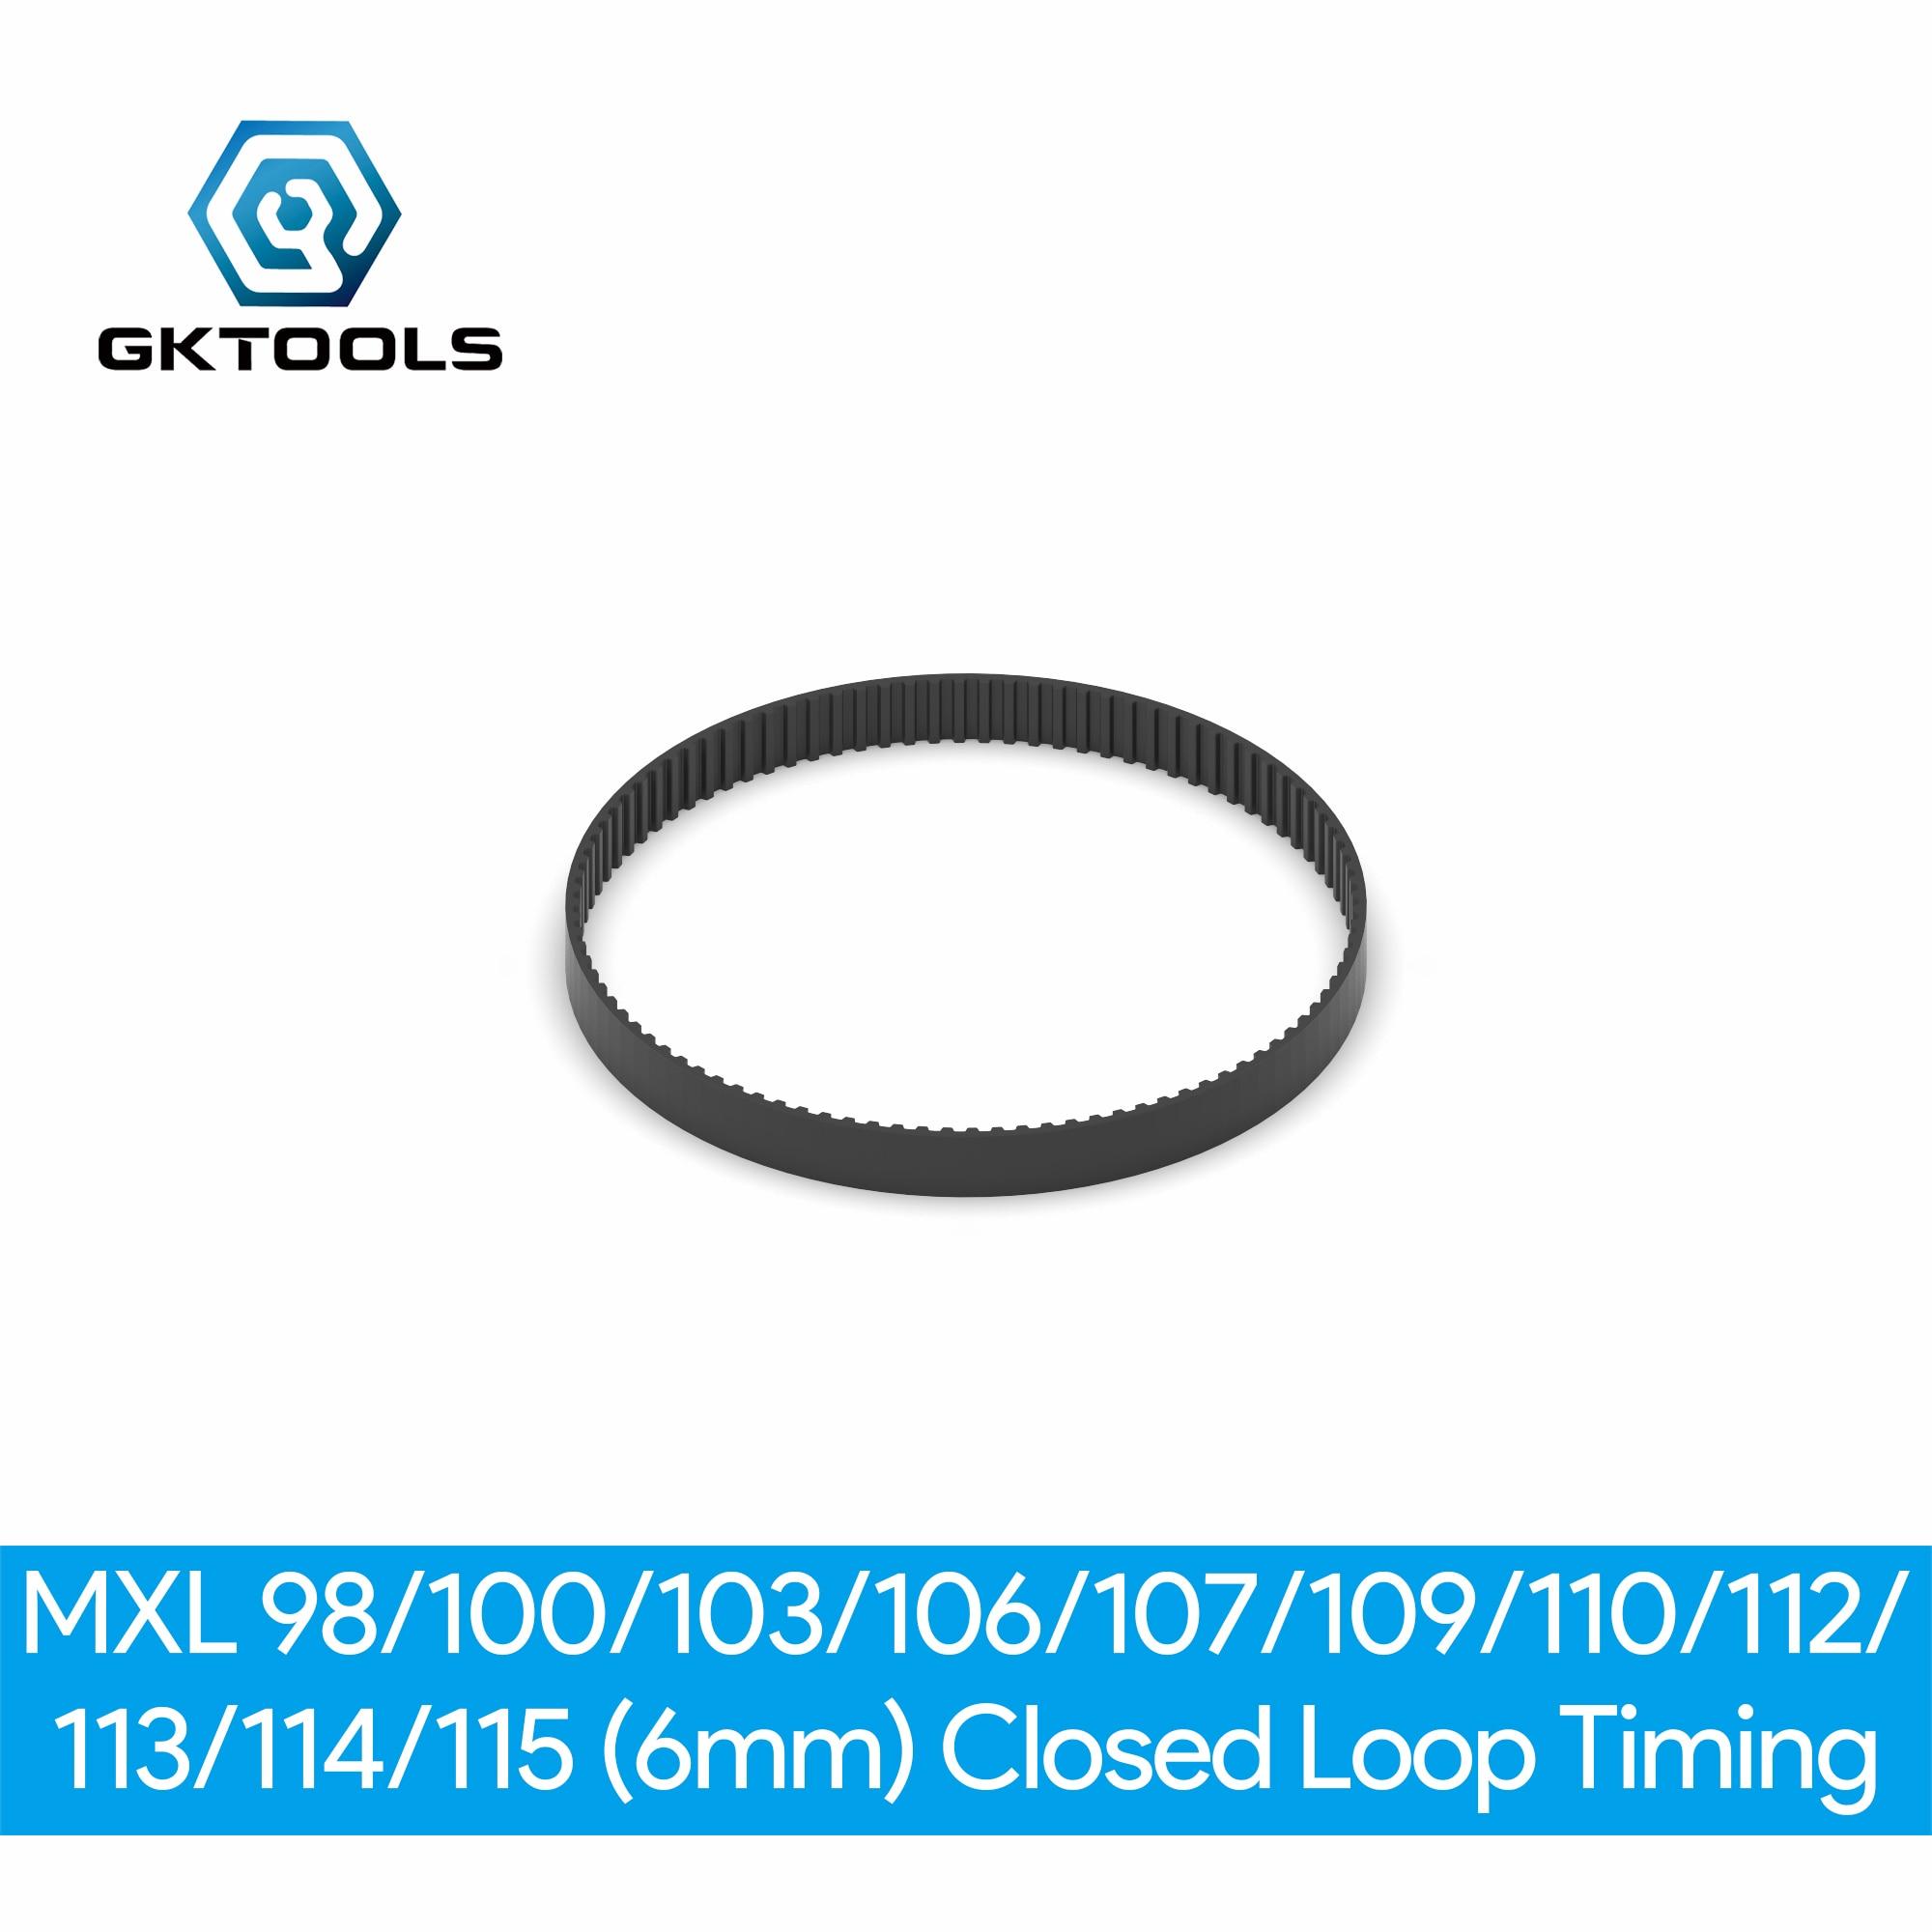 B98MXL B100MXL B103MXL B106MXL B107MXL B109MXL B110MXL B112MXL B113MXL B114MXL B115MXL de bucle cerrado correa dentada de goma ancho 6mm